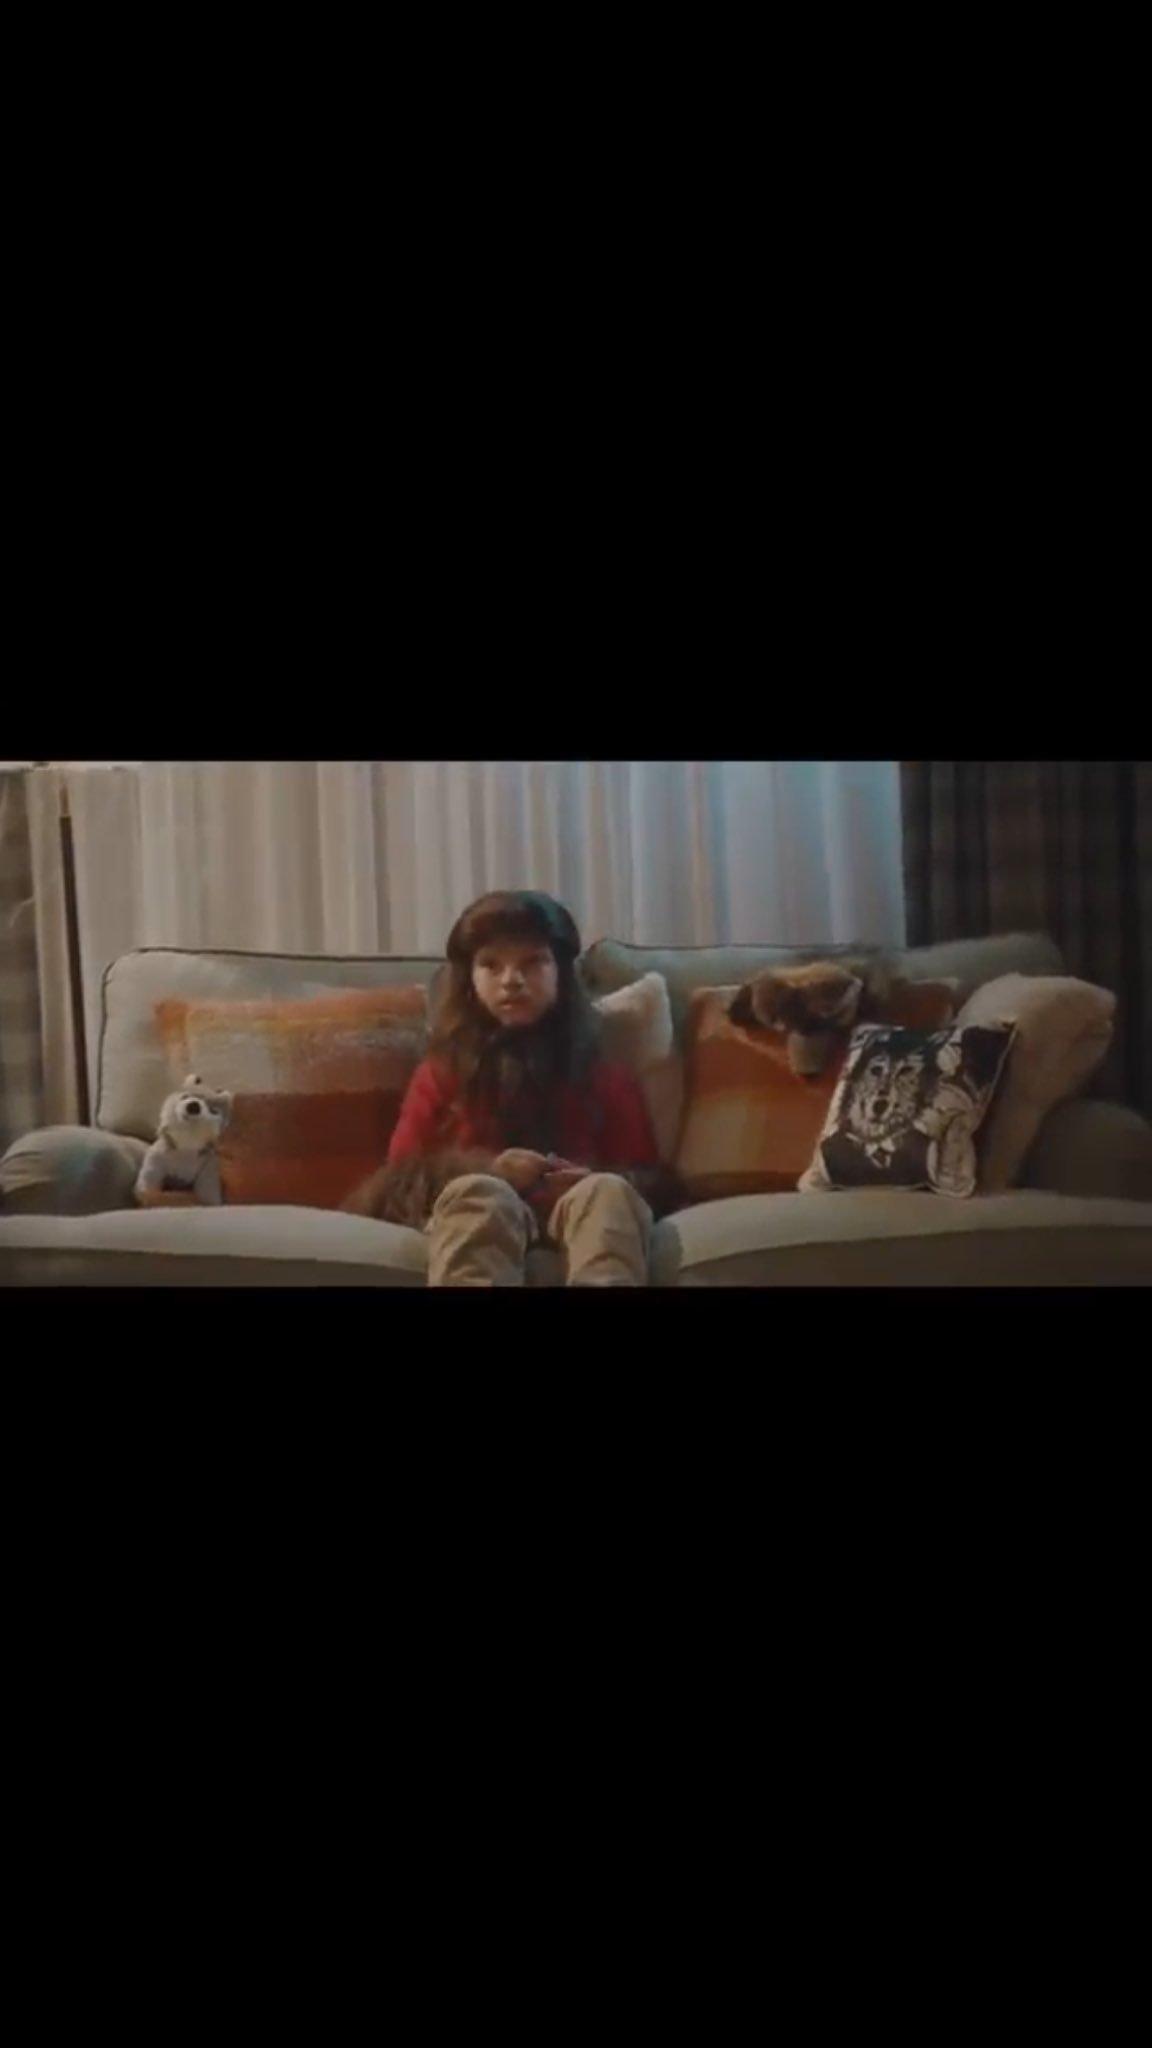 Love this ad. Big ups t' Teen Wolf https://t.co/KjkemRKWlu